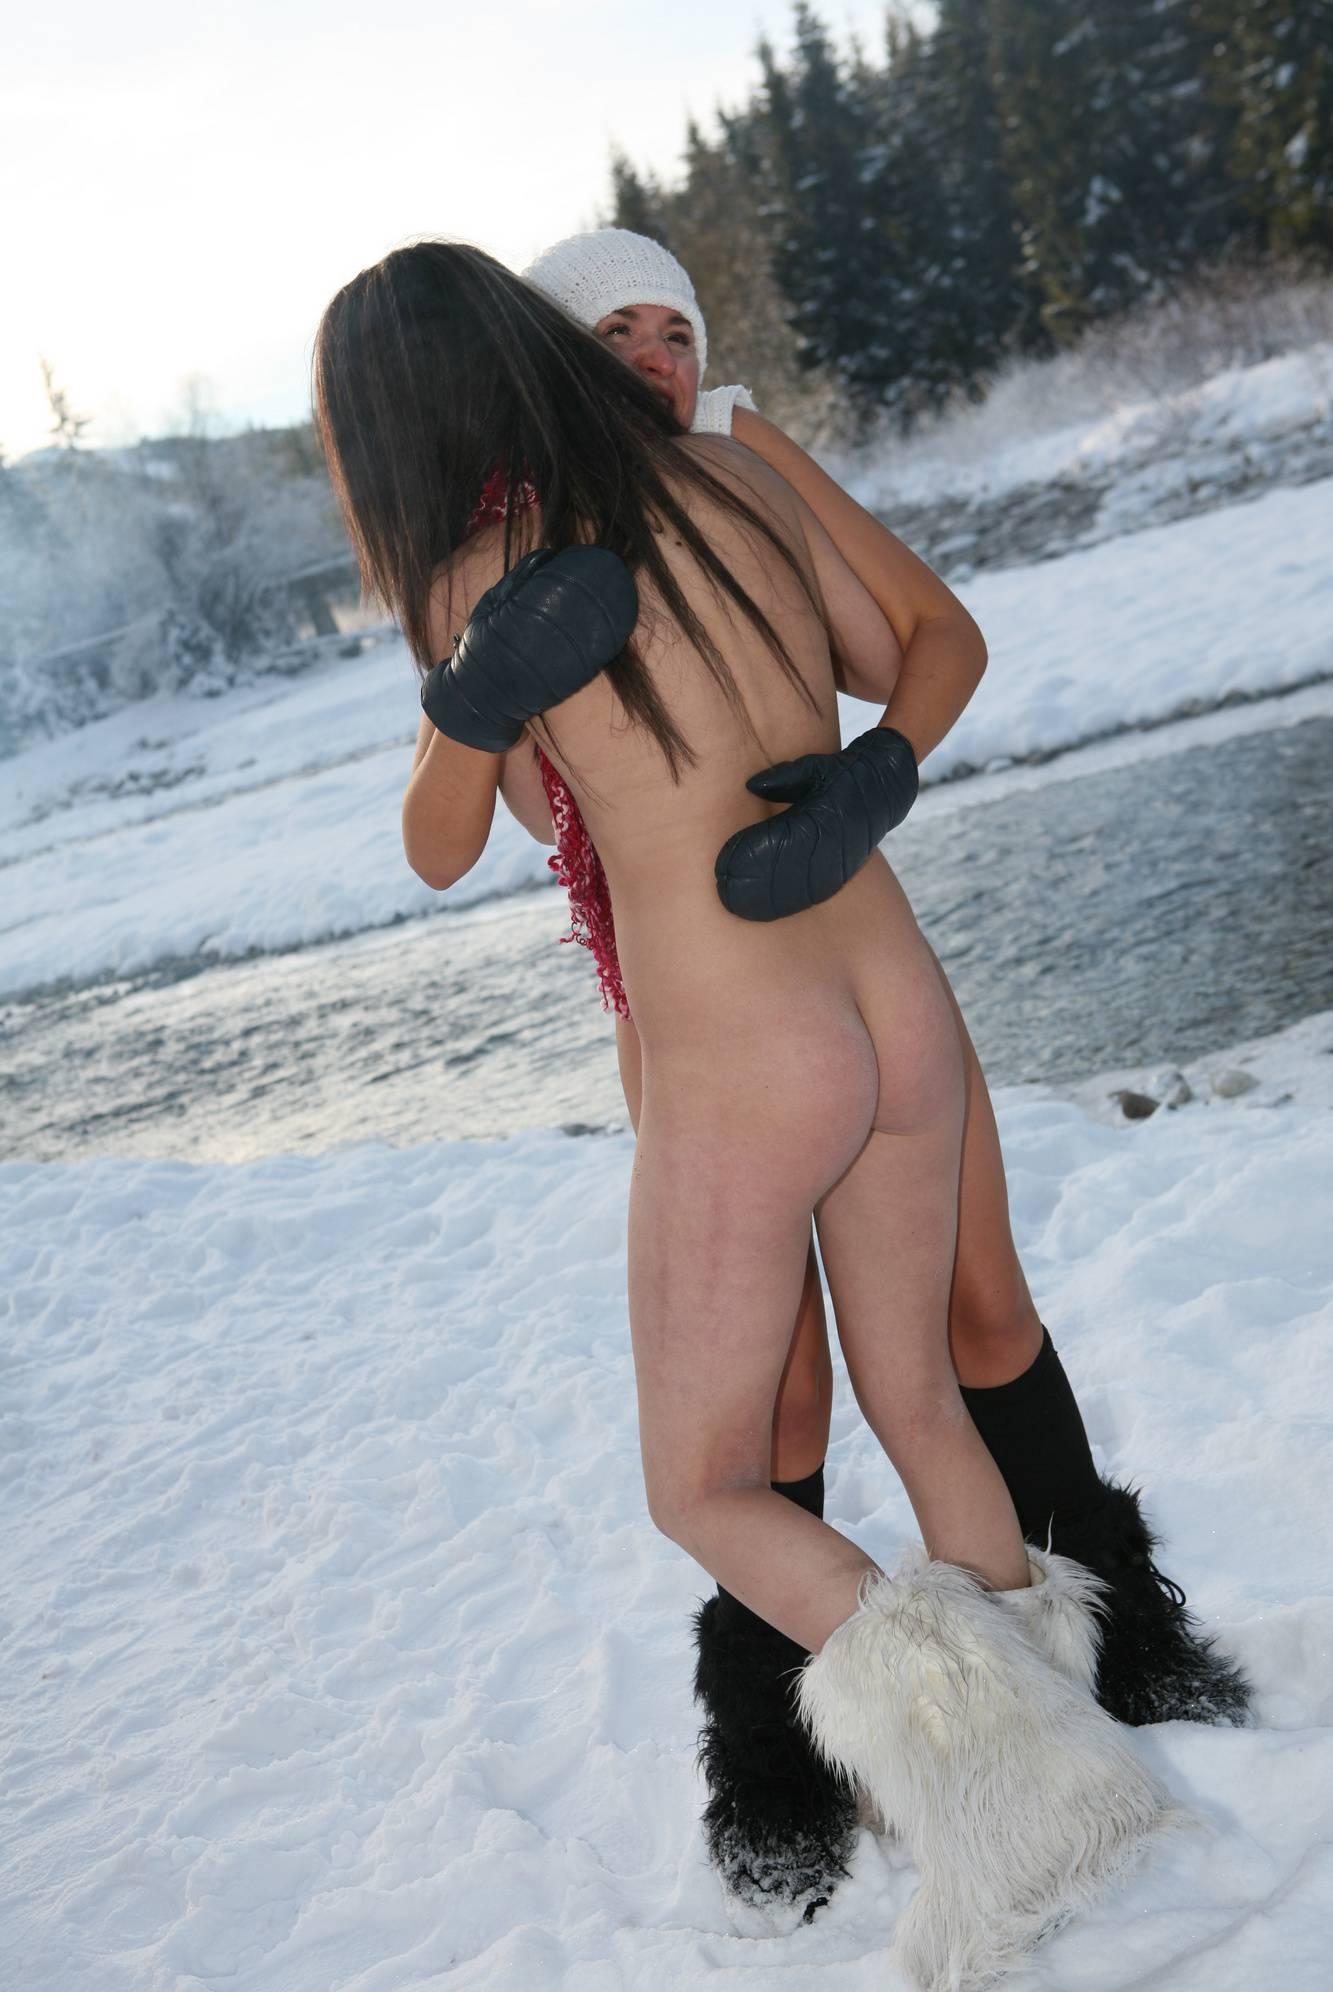 Snow Day Girls Frolicking - 1